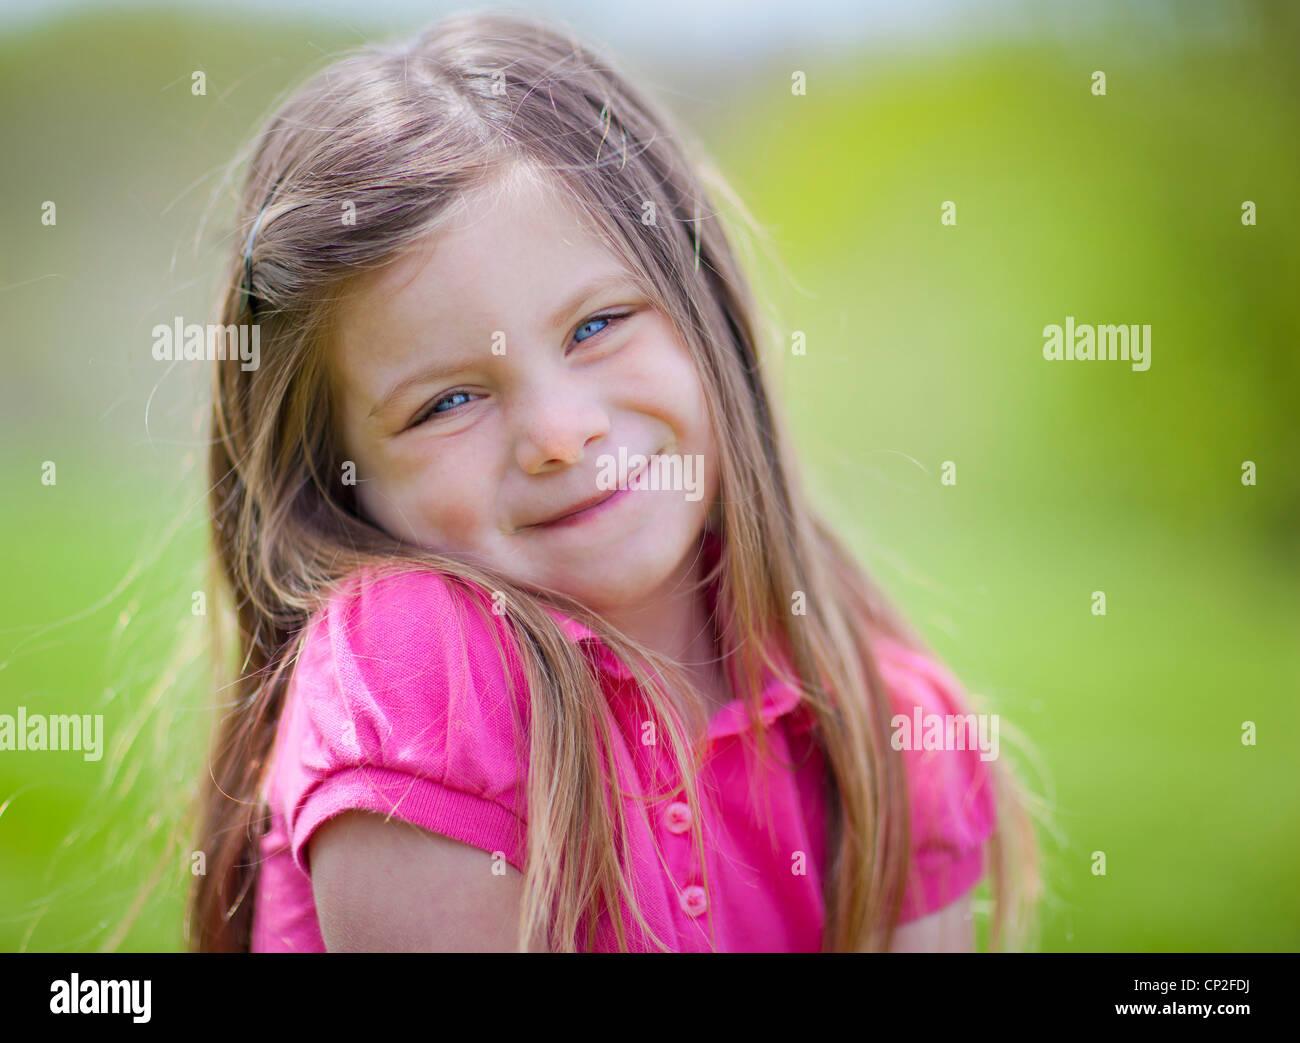 girl child shrug not cutout stock photos girl child shrug not